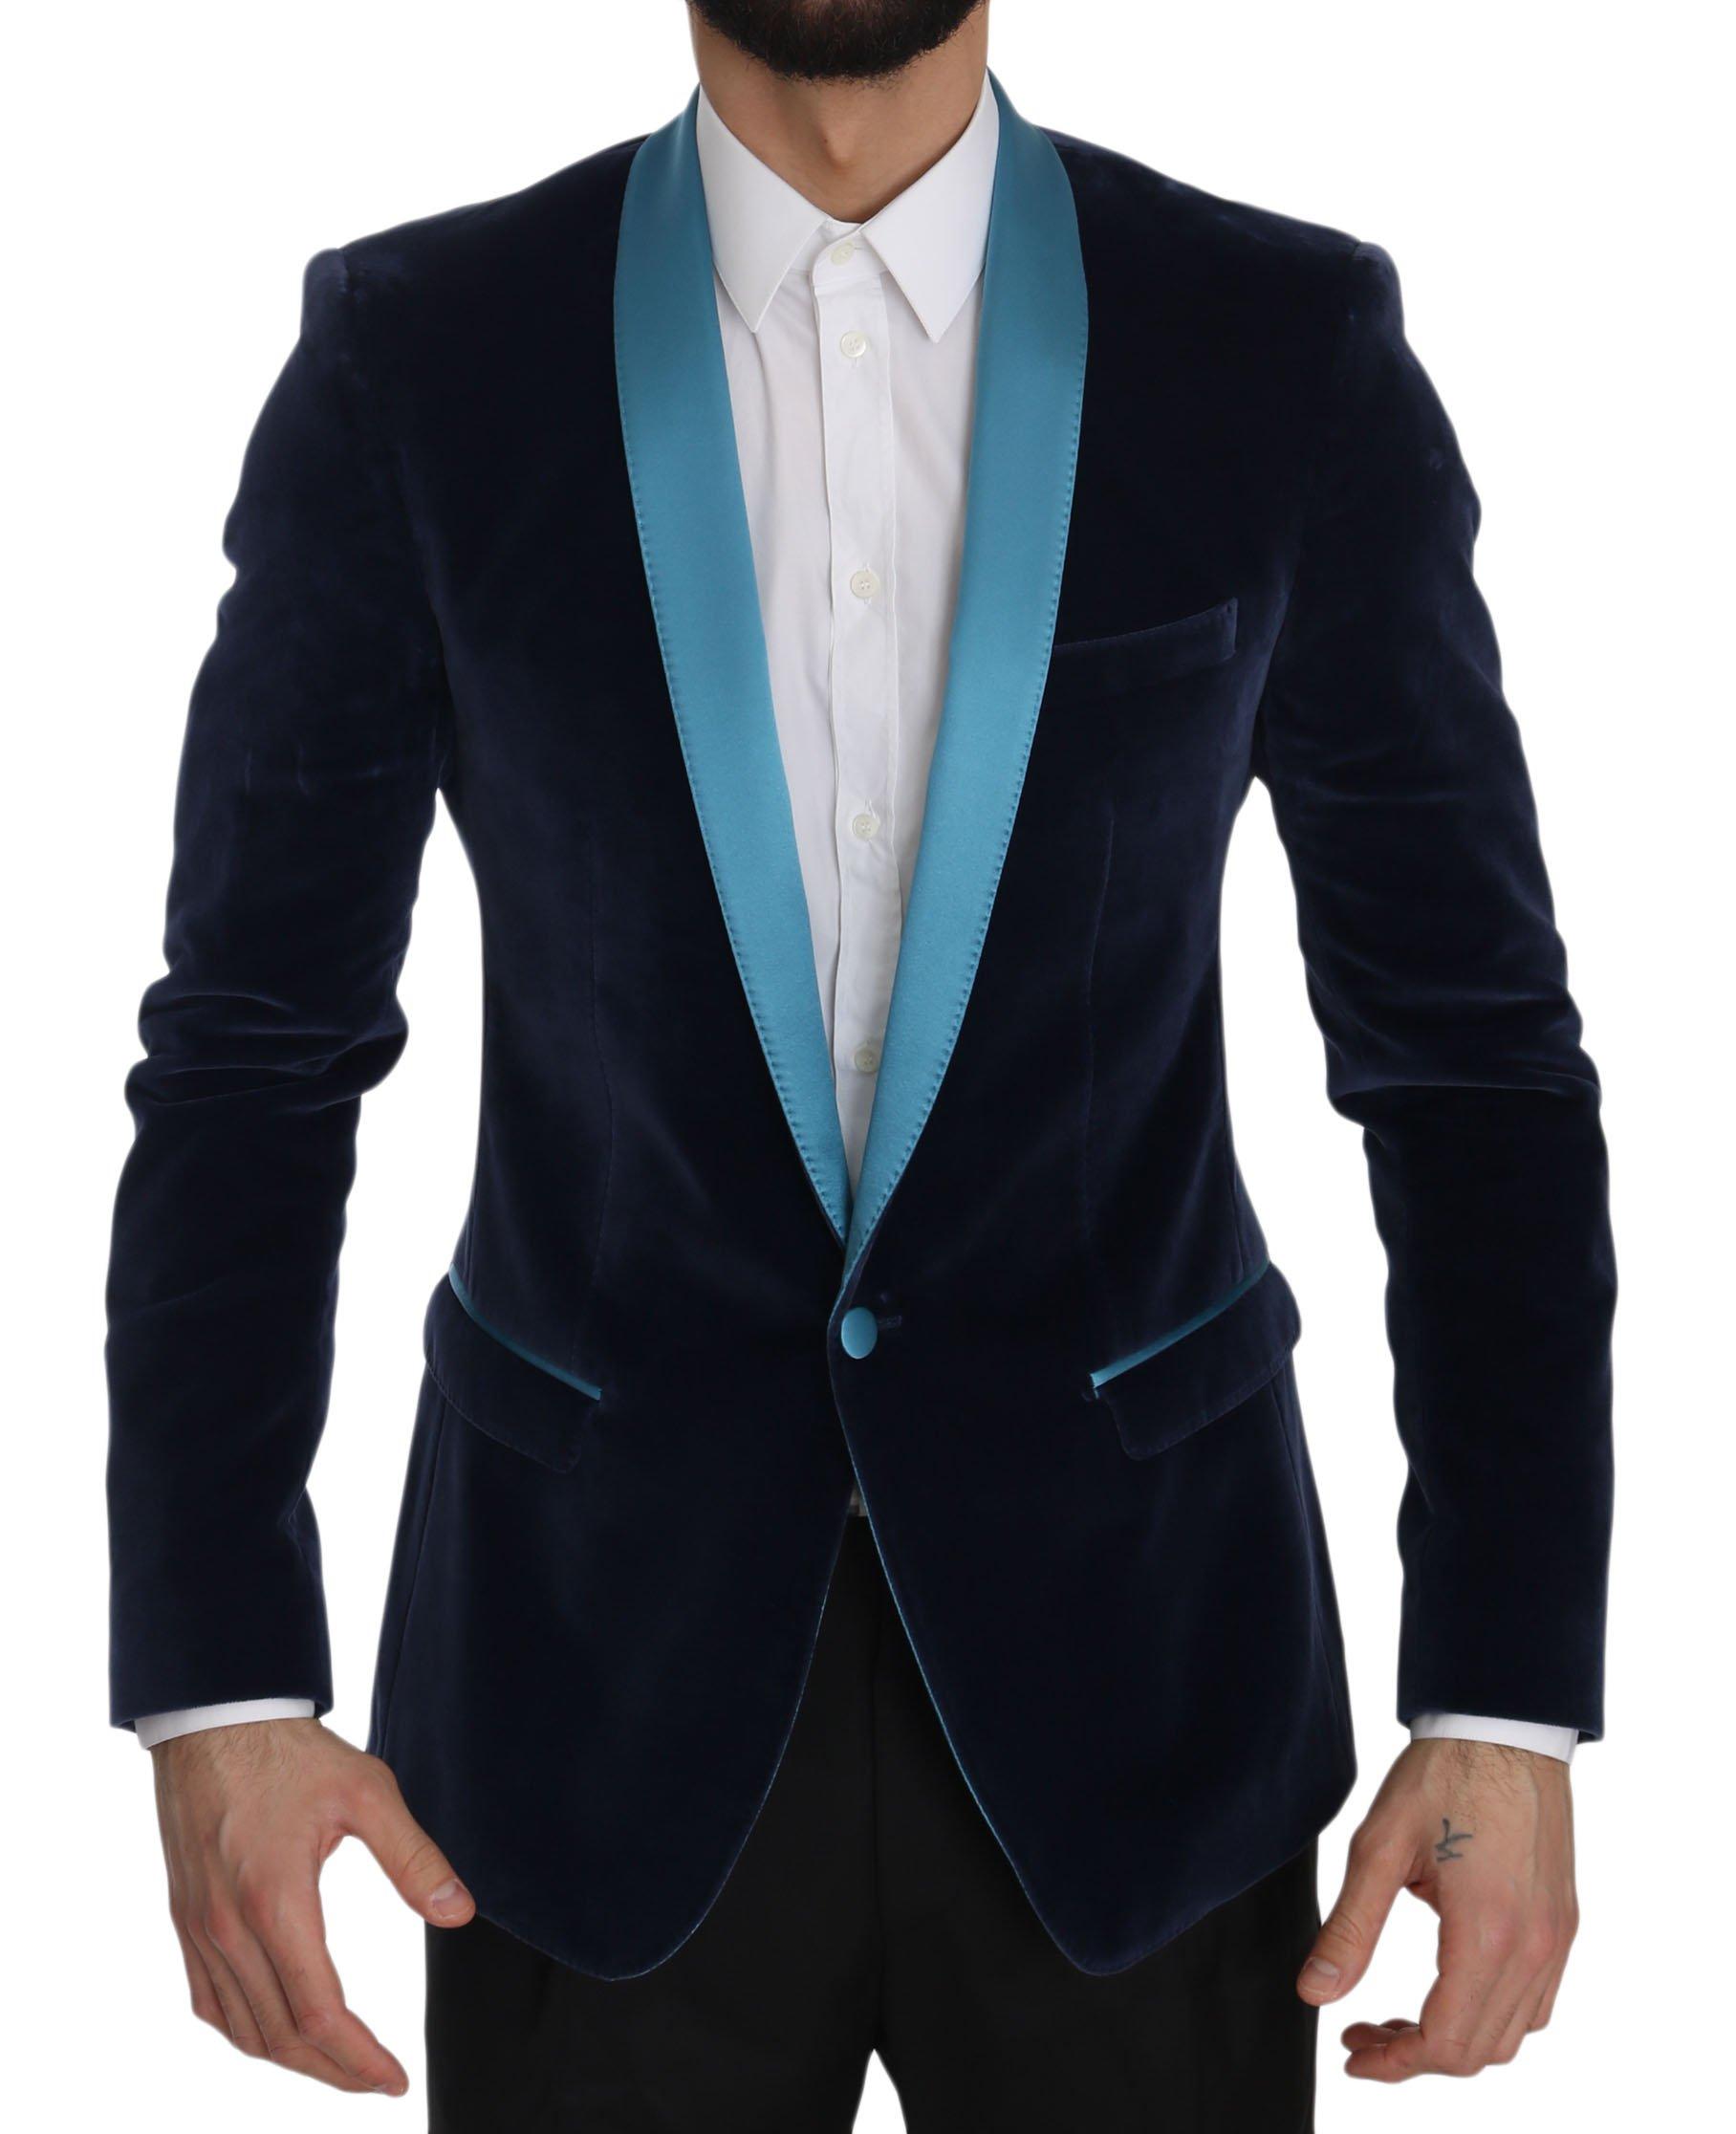 Dolce & Gabbana Men's Blazer Blue JKT2397 - IT46   S